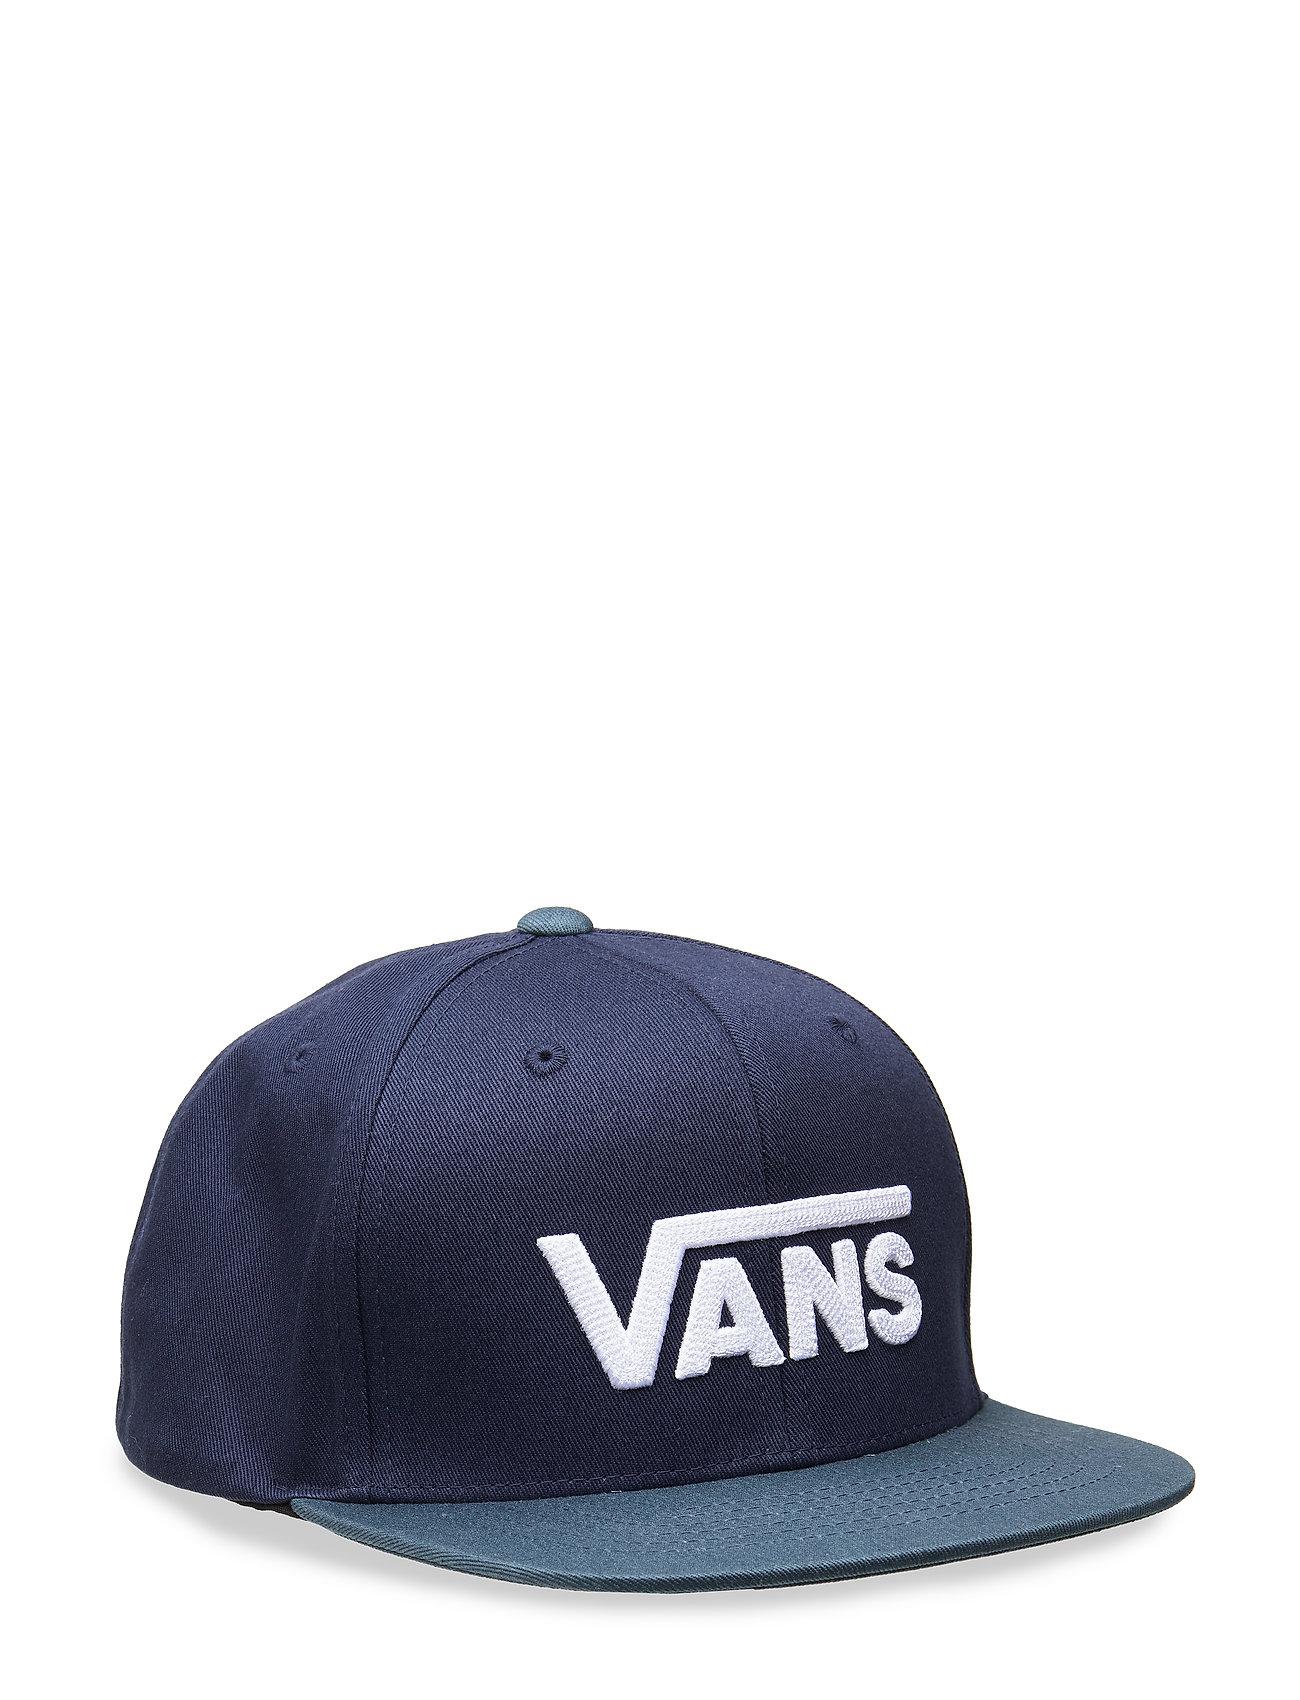 VANS DROP V II SNAPBACK BOYS - STARGAZER/DRESS BLUES